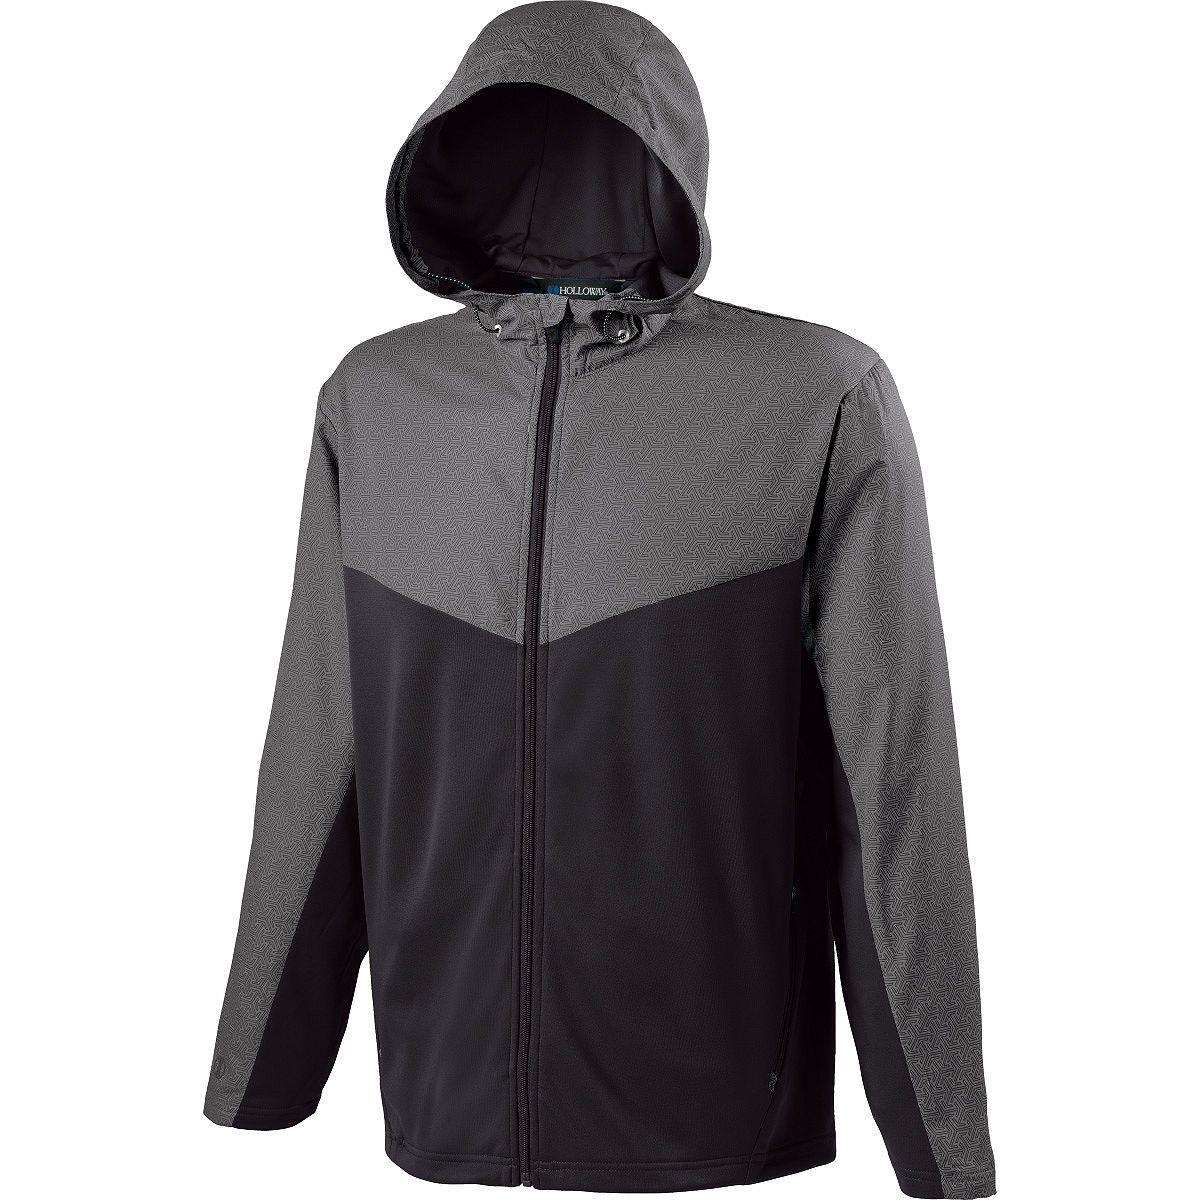 Adult Crossover Jacket - GREY PRINT/BLACK